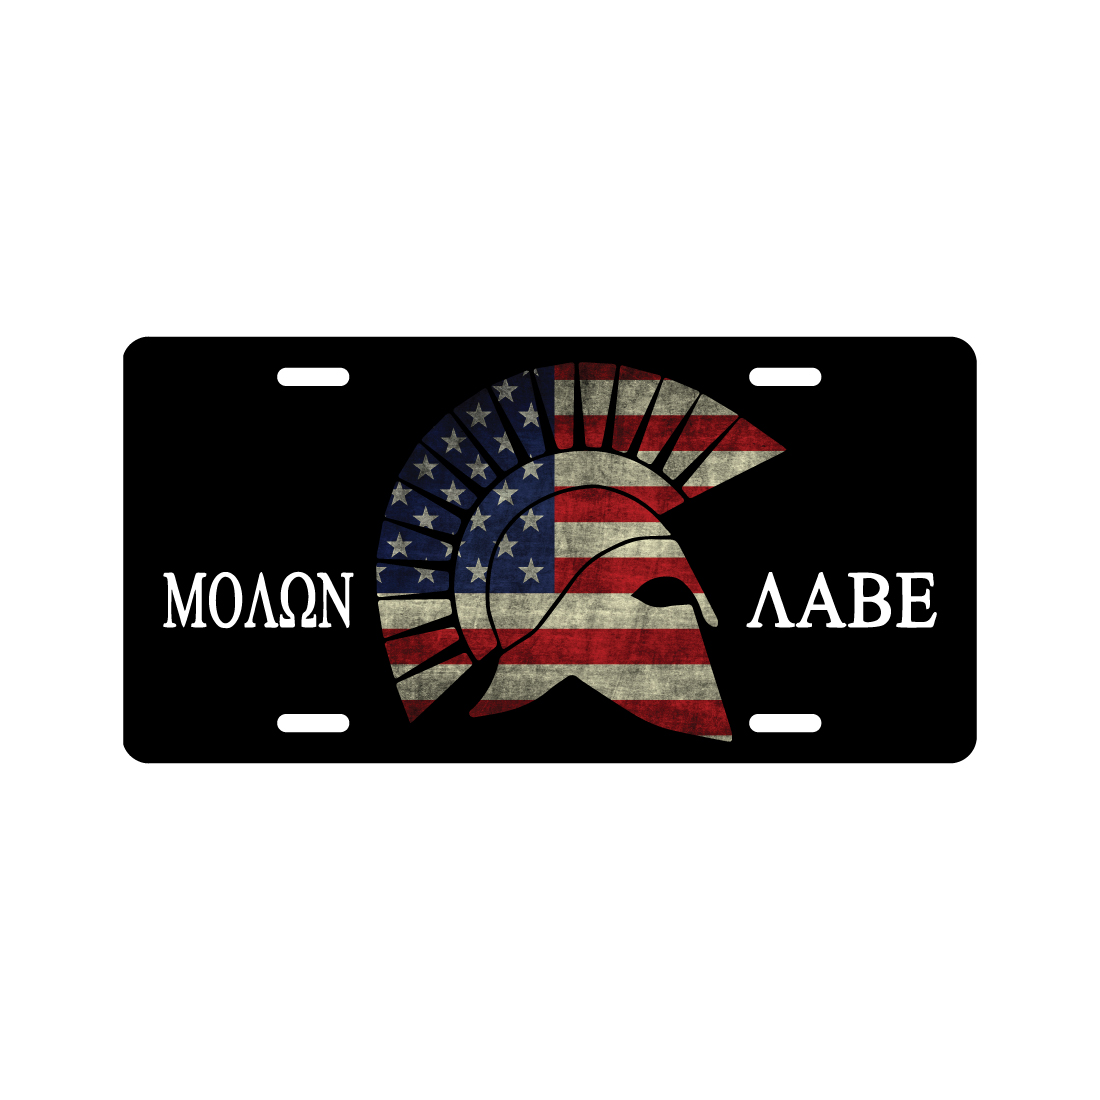 Molon Labe American Flag License Plate 2nd amendment Novelty Tag cheapyardsigns